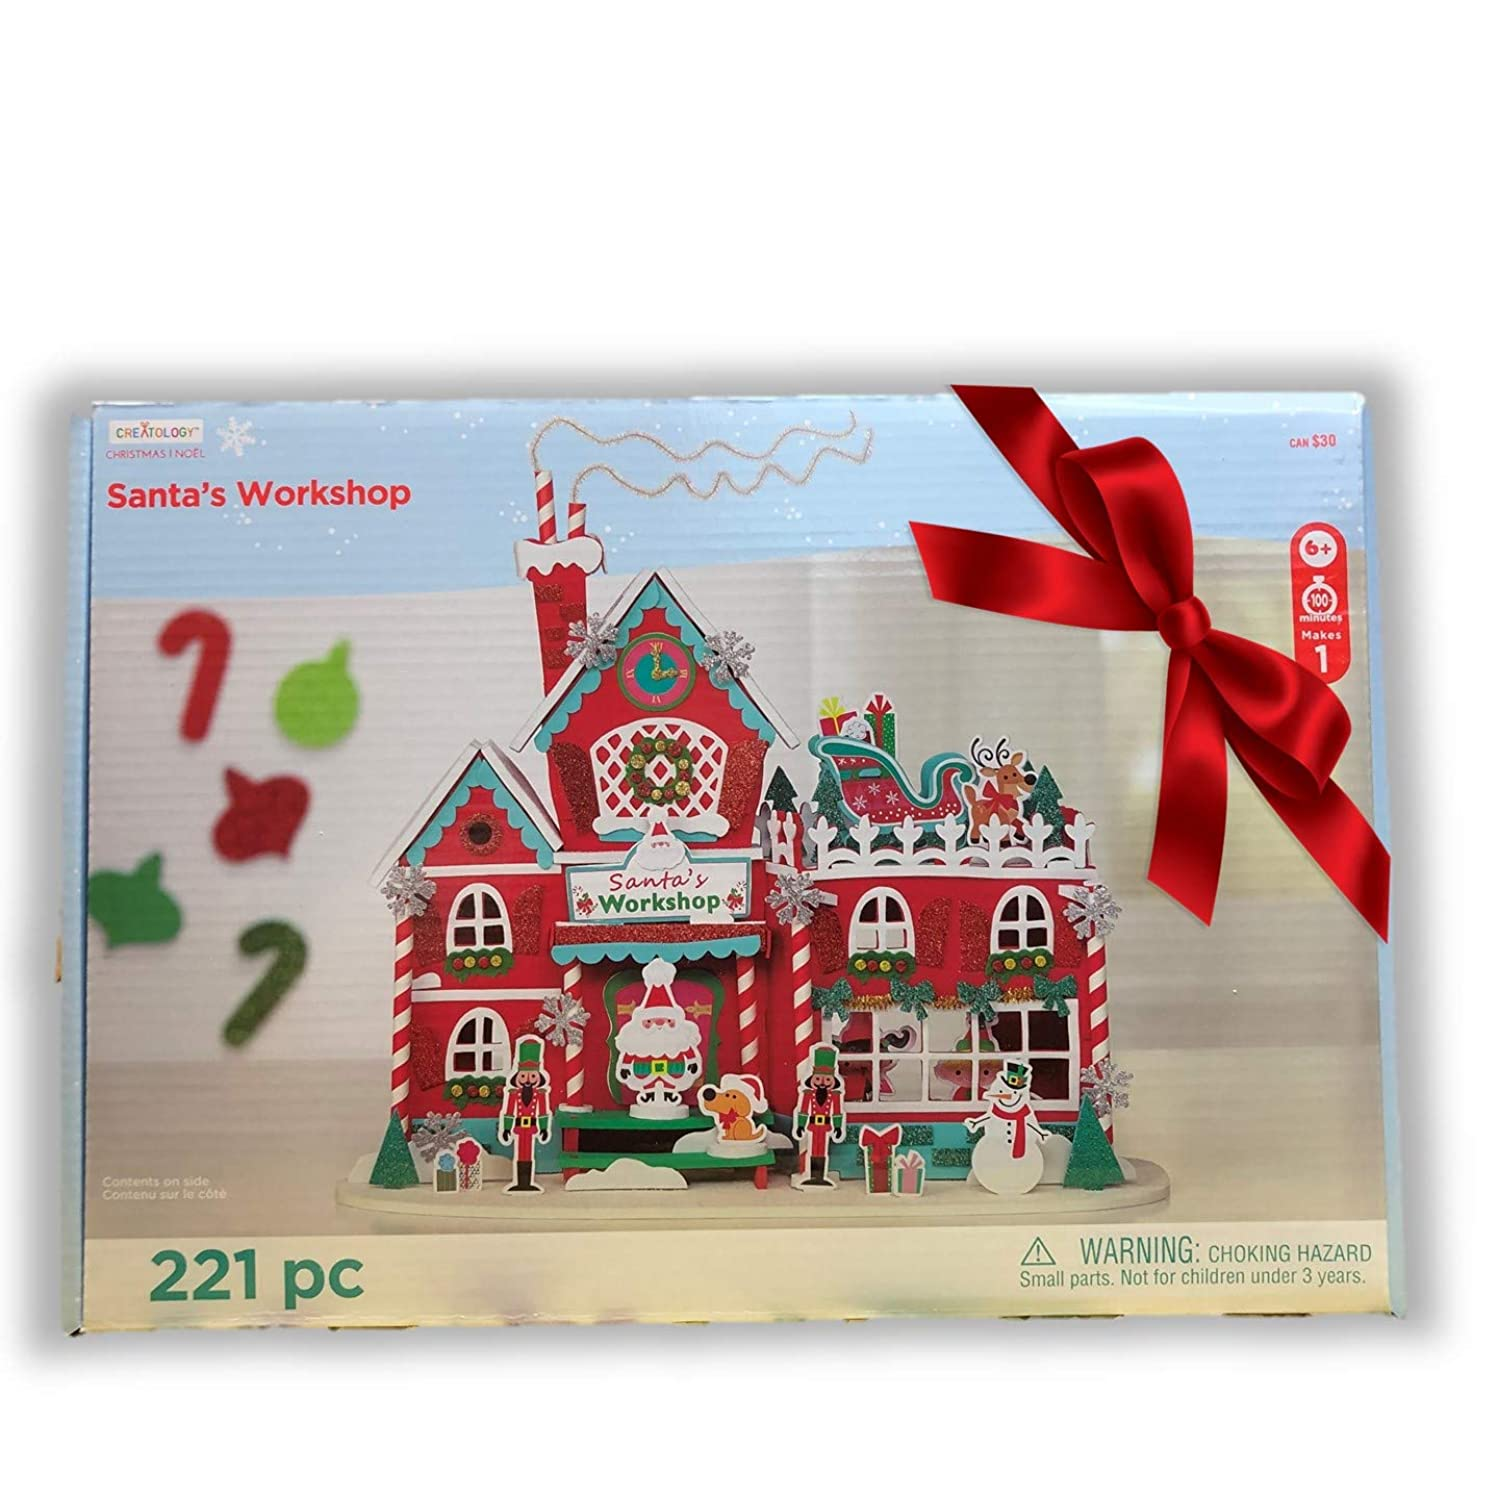 Creatology 221 Piece 3D Santa's Christmas Workshop Foam Kit